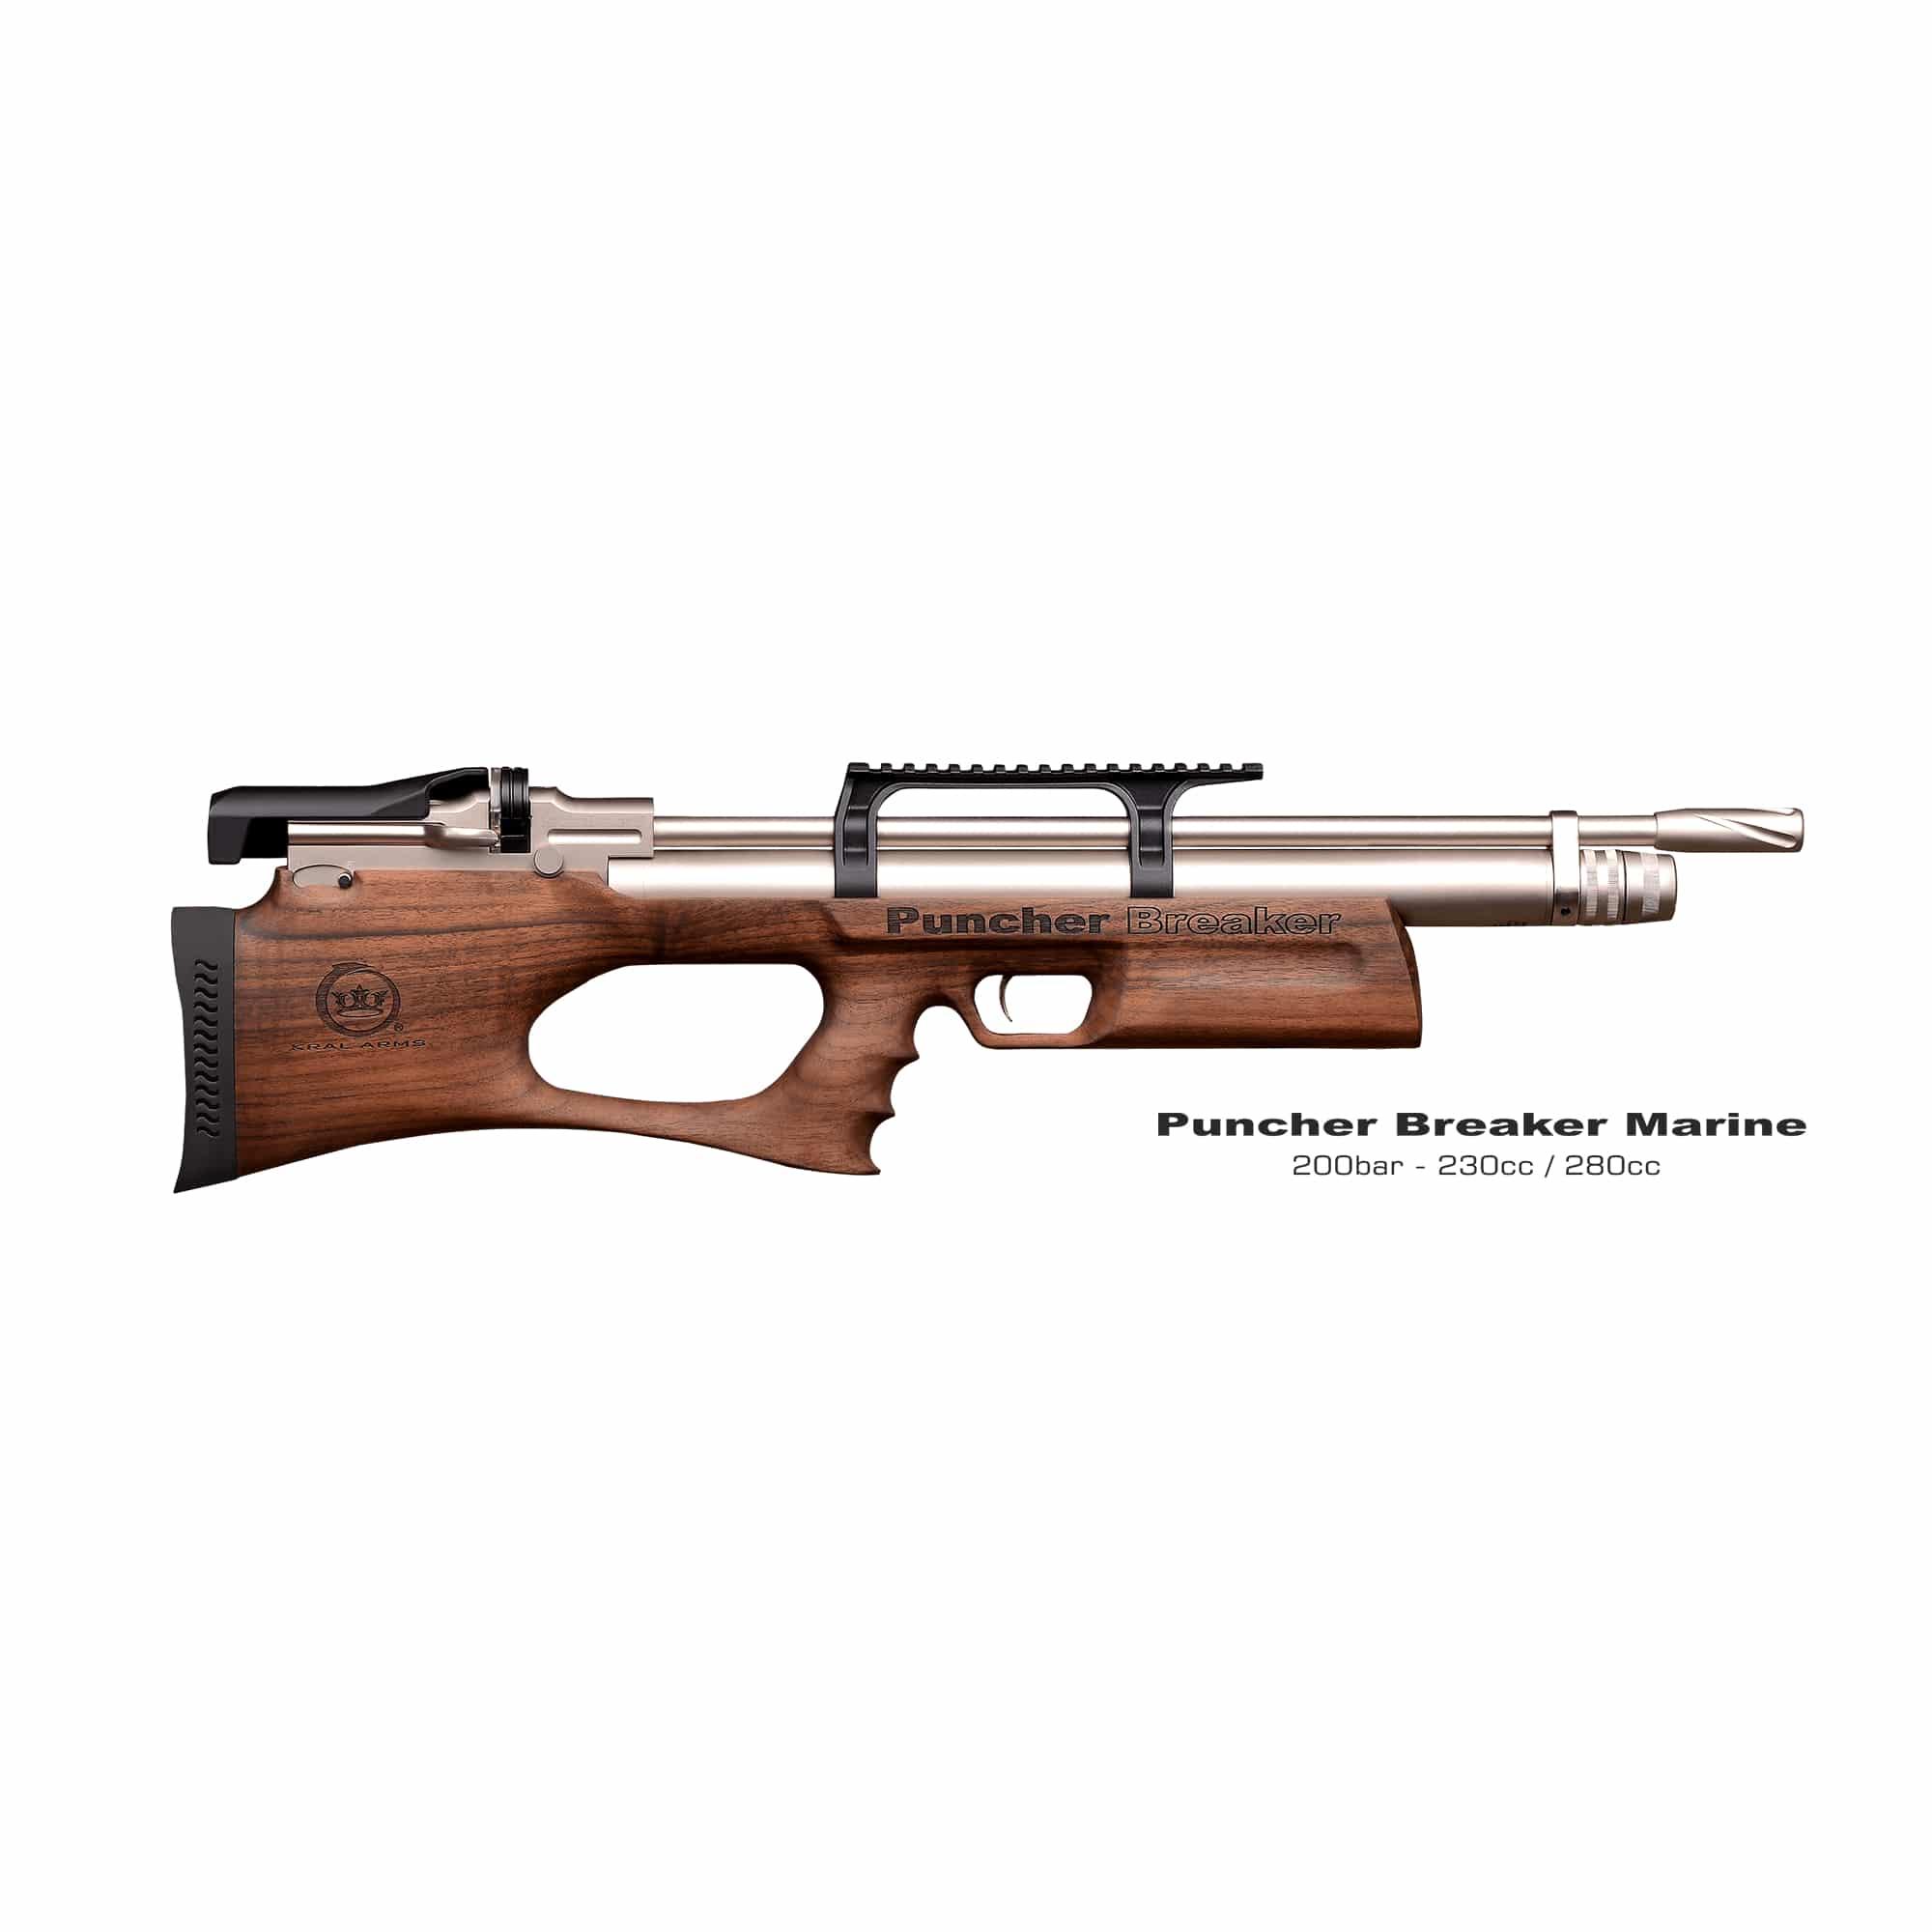 Kral Puncher Breaker Marine Bullpup .177 or .22 PCP Air Rifle